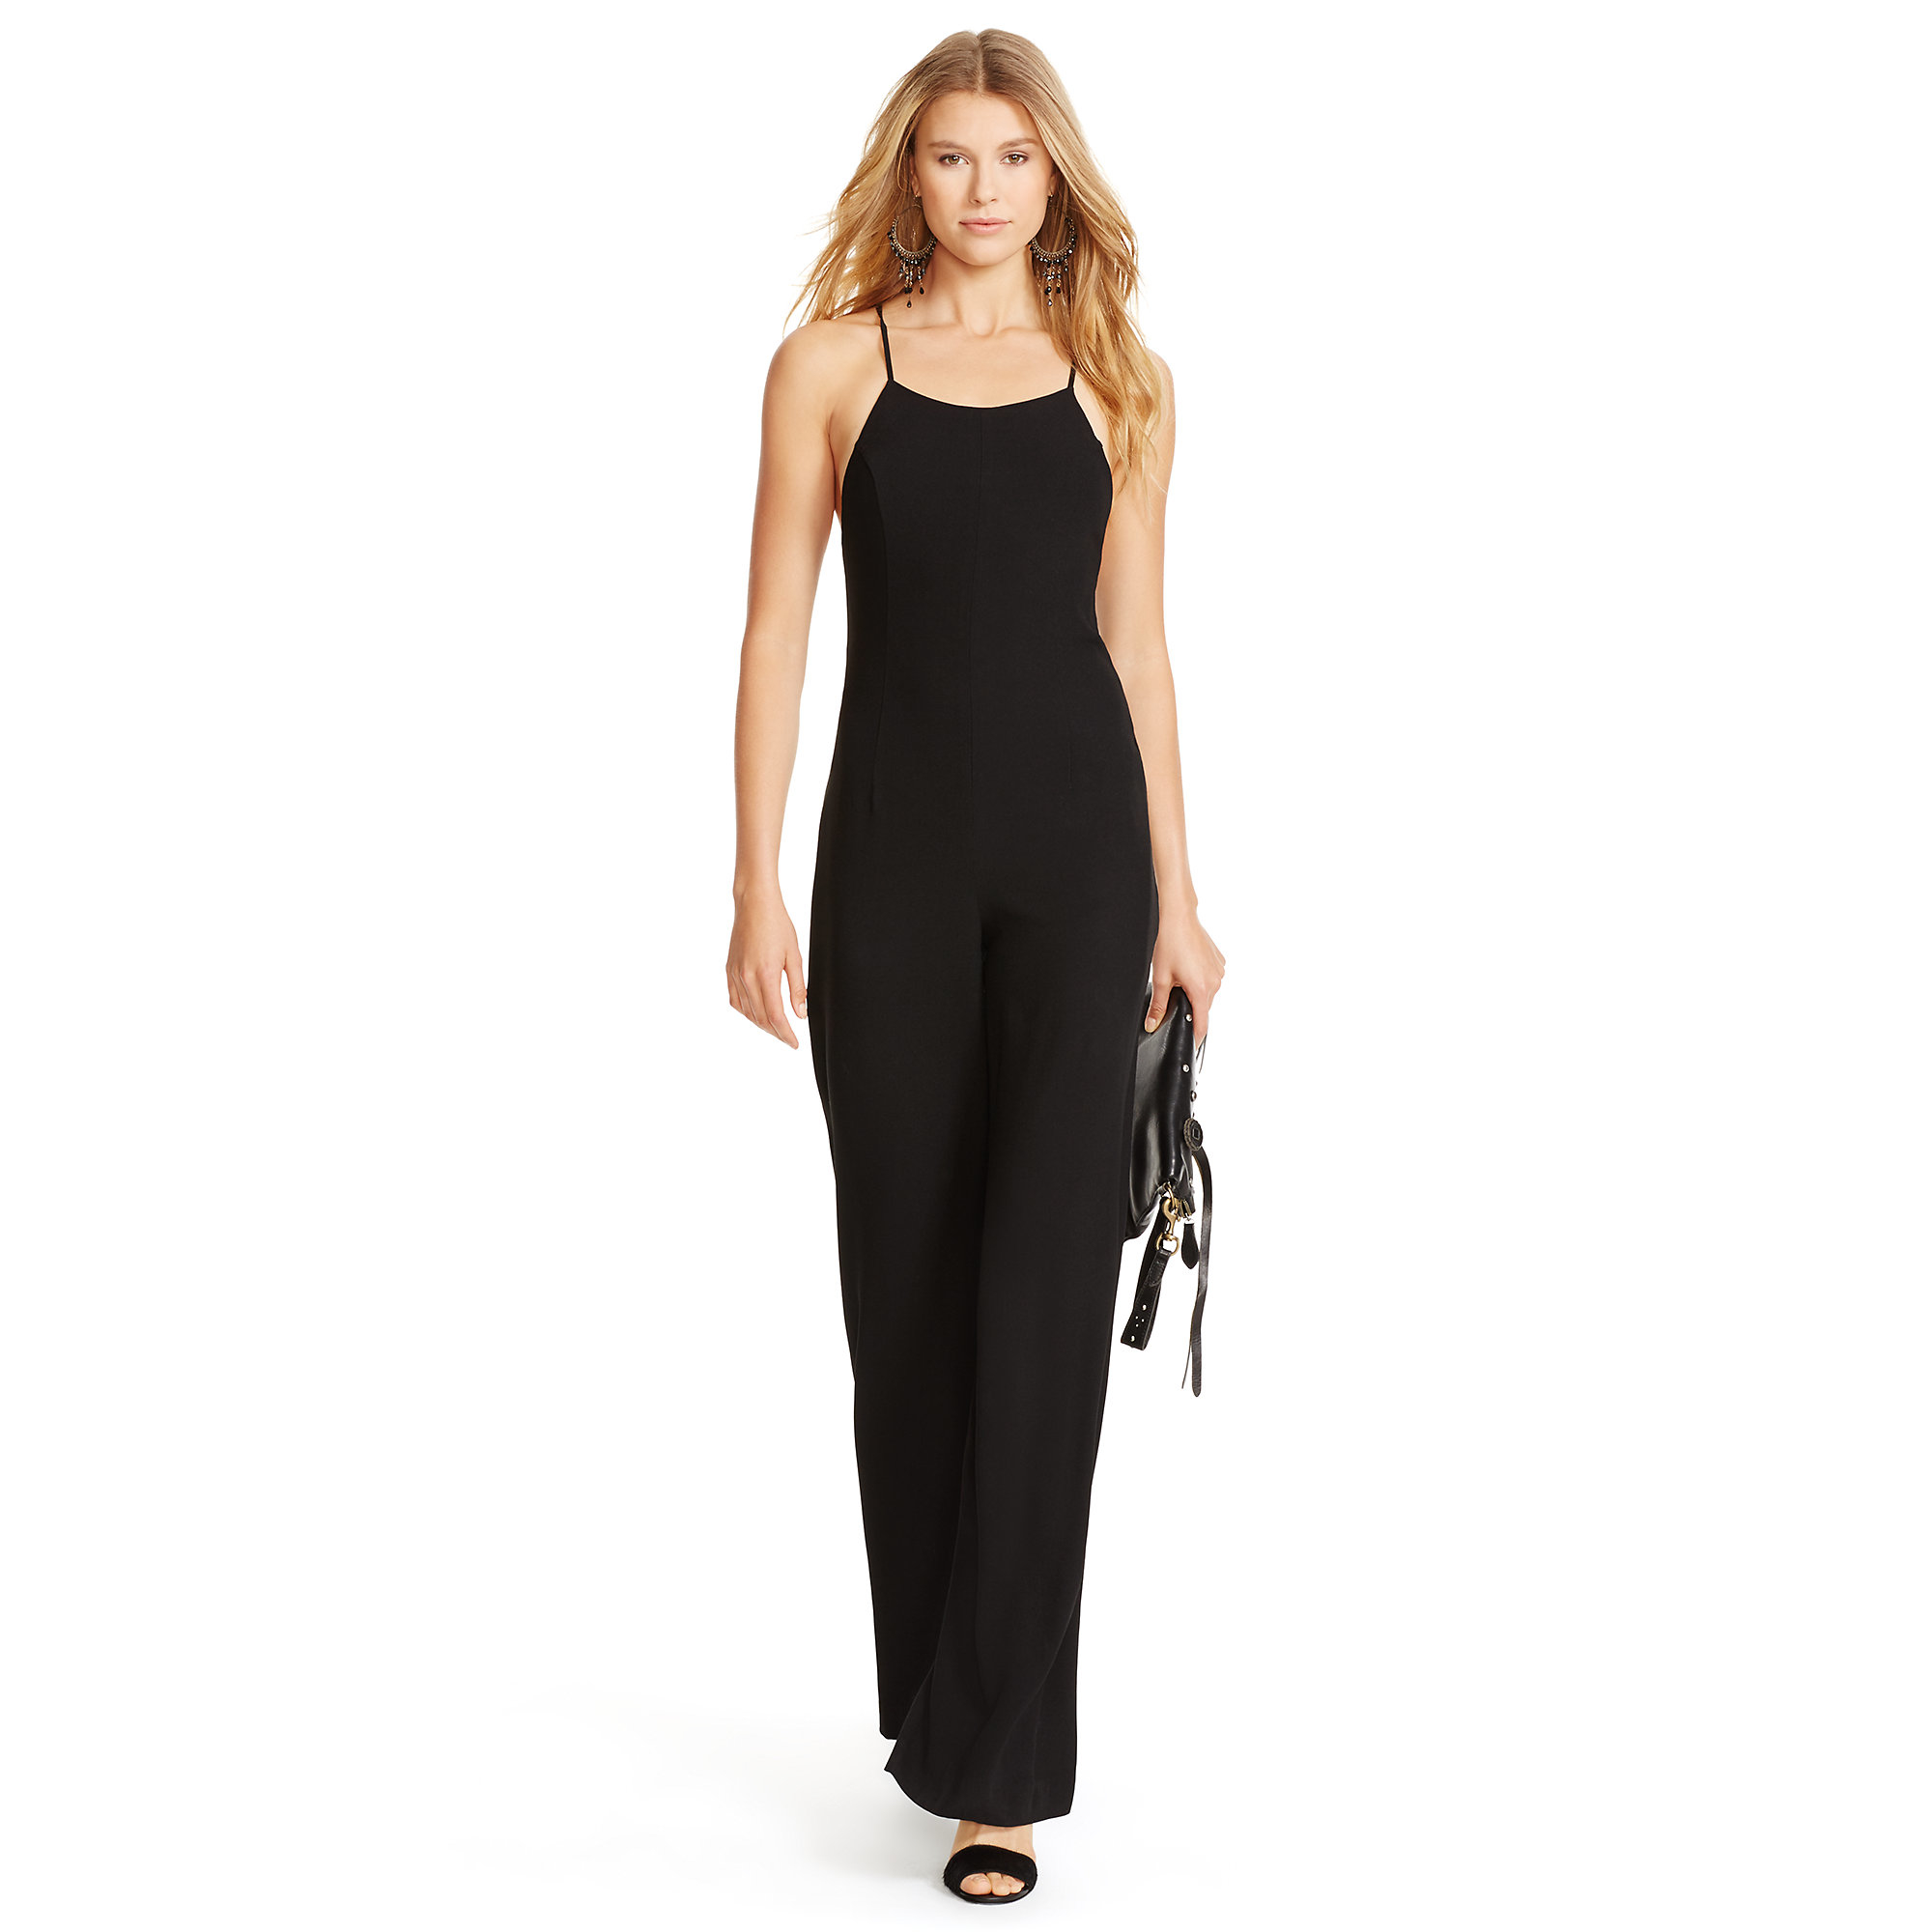 d6d64f19419 Lyst - Polo Ralph Lauren Wide-leg Open-back Jumpsuit in Black